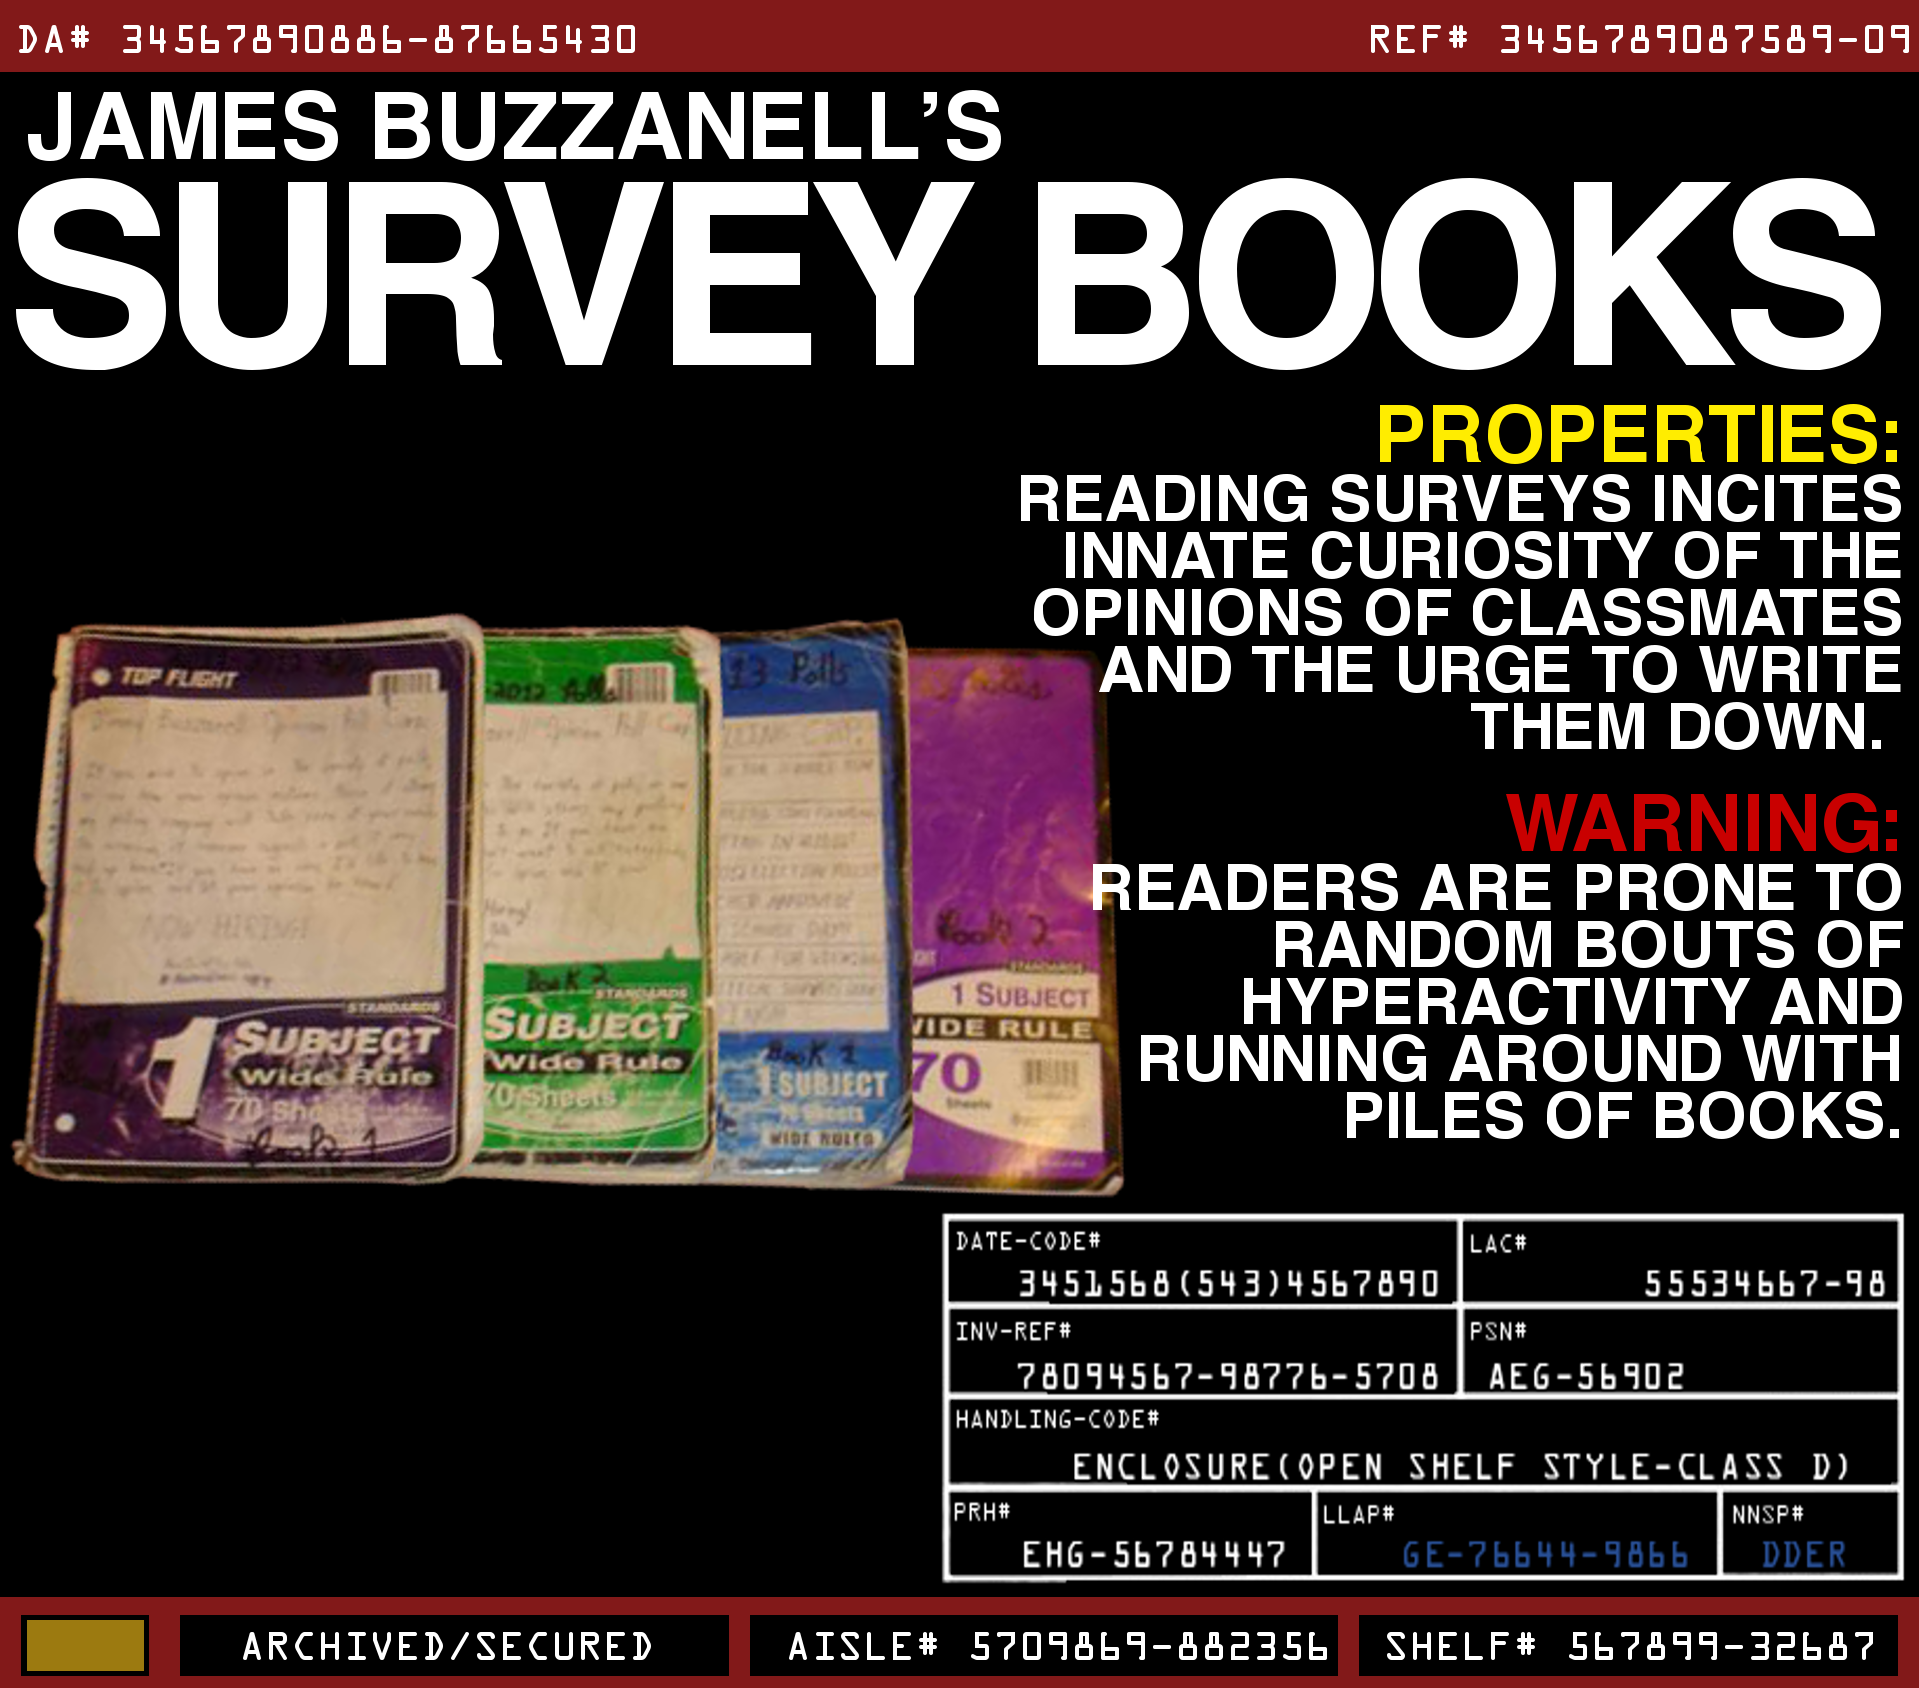 James Buzzanell's Survey Books